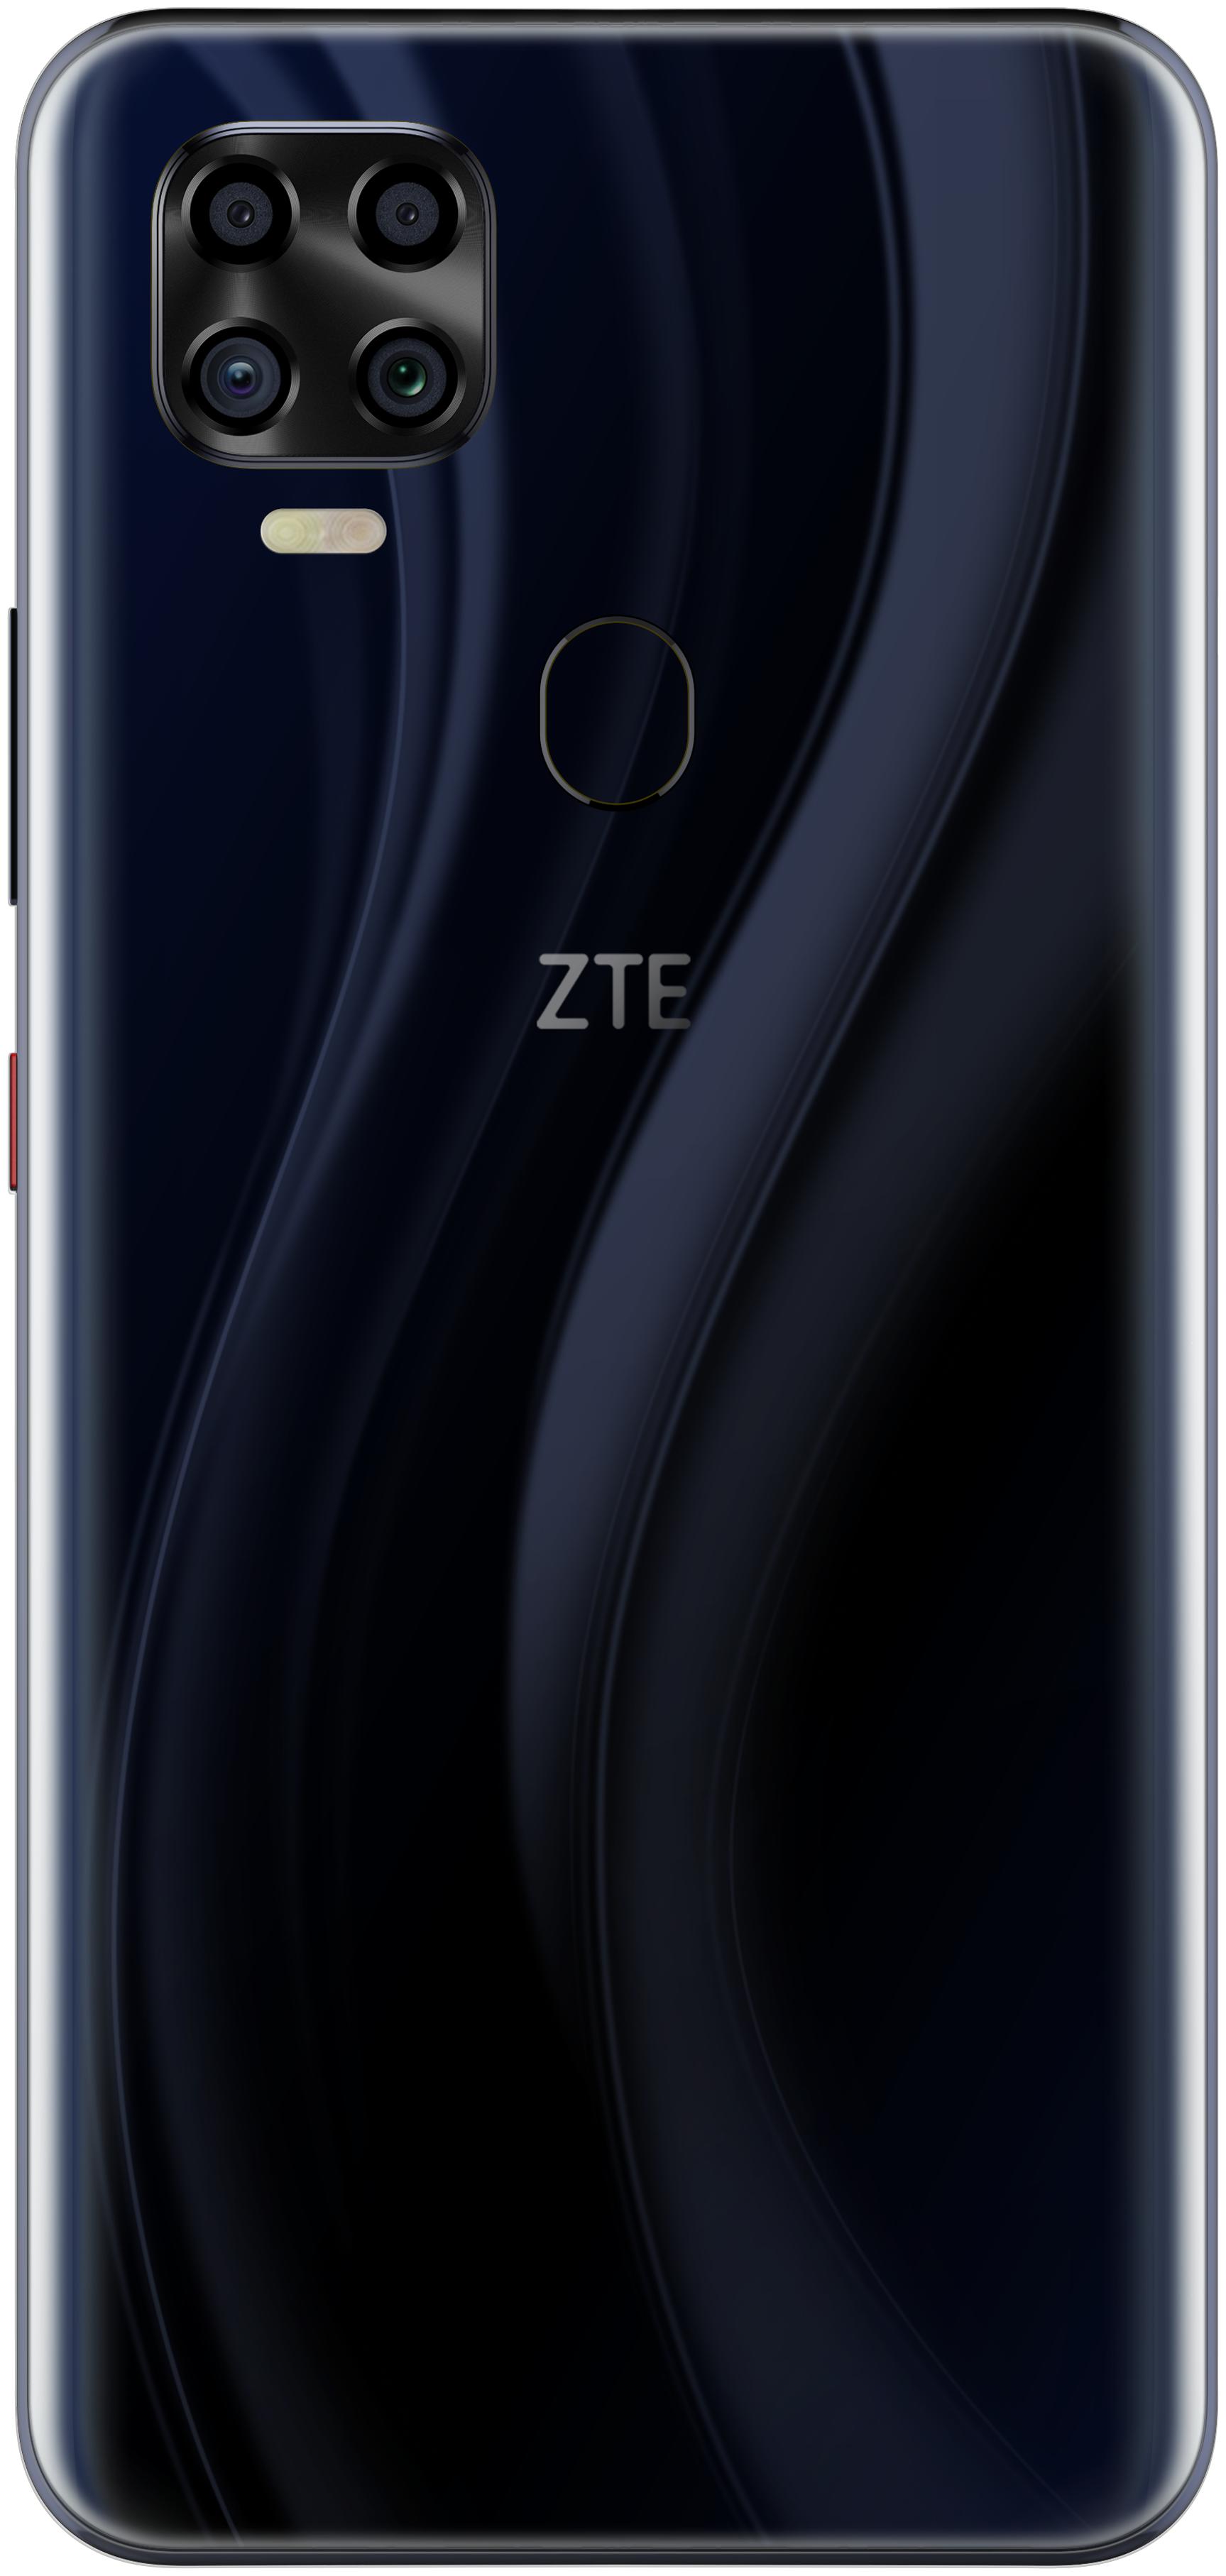 ZTE Blade V2020 - память: 128ГБ, слот для карты памяти